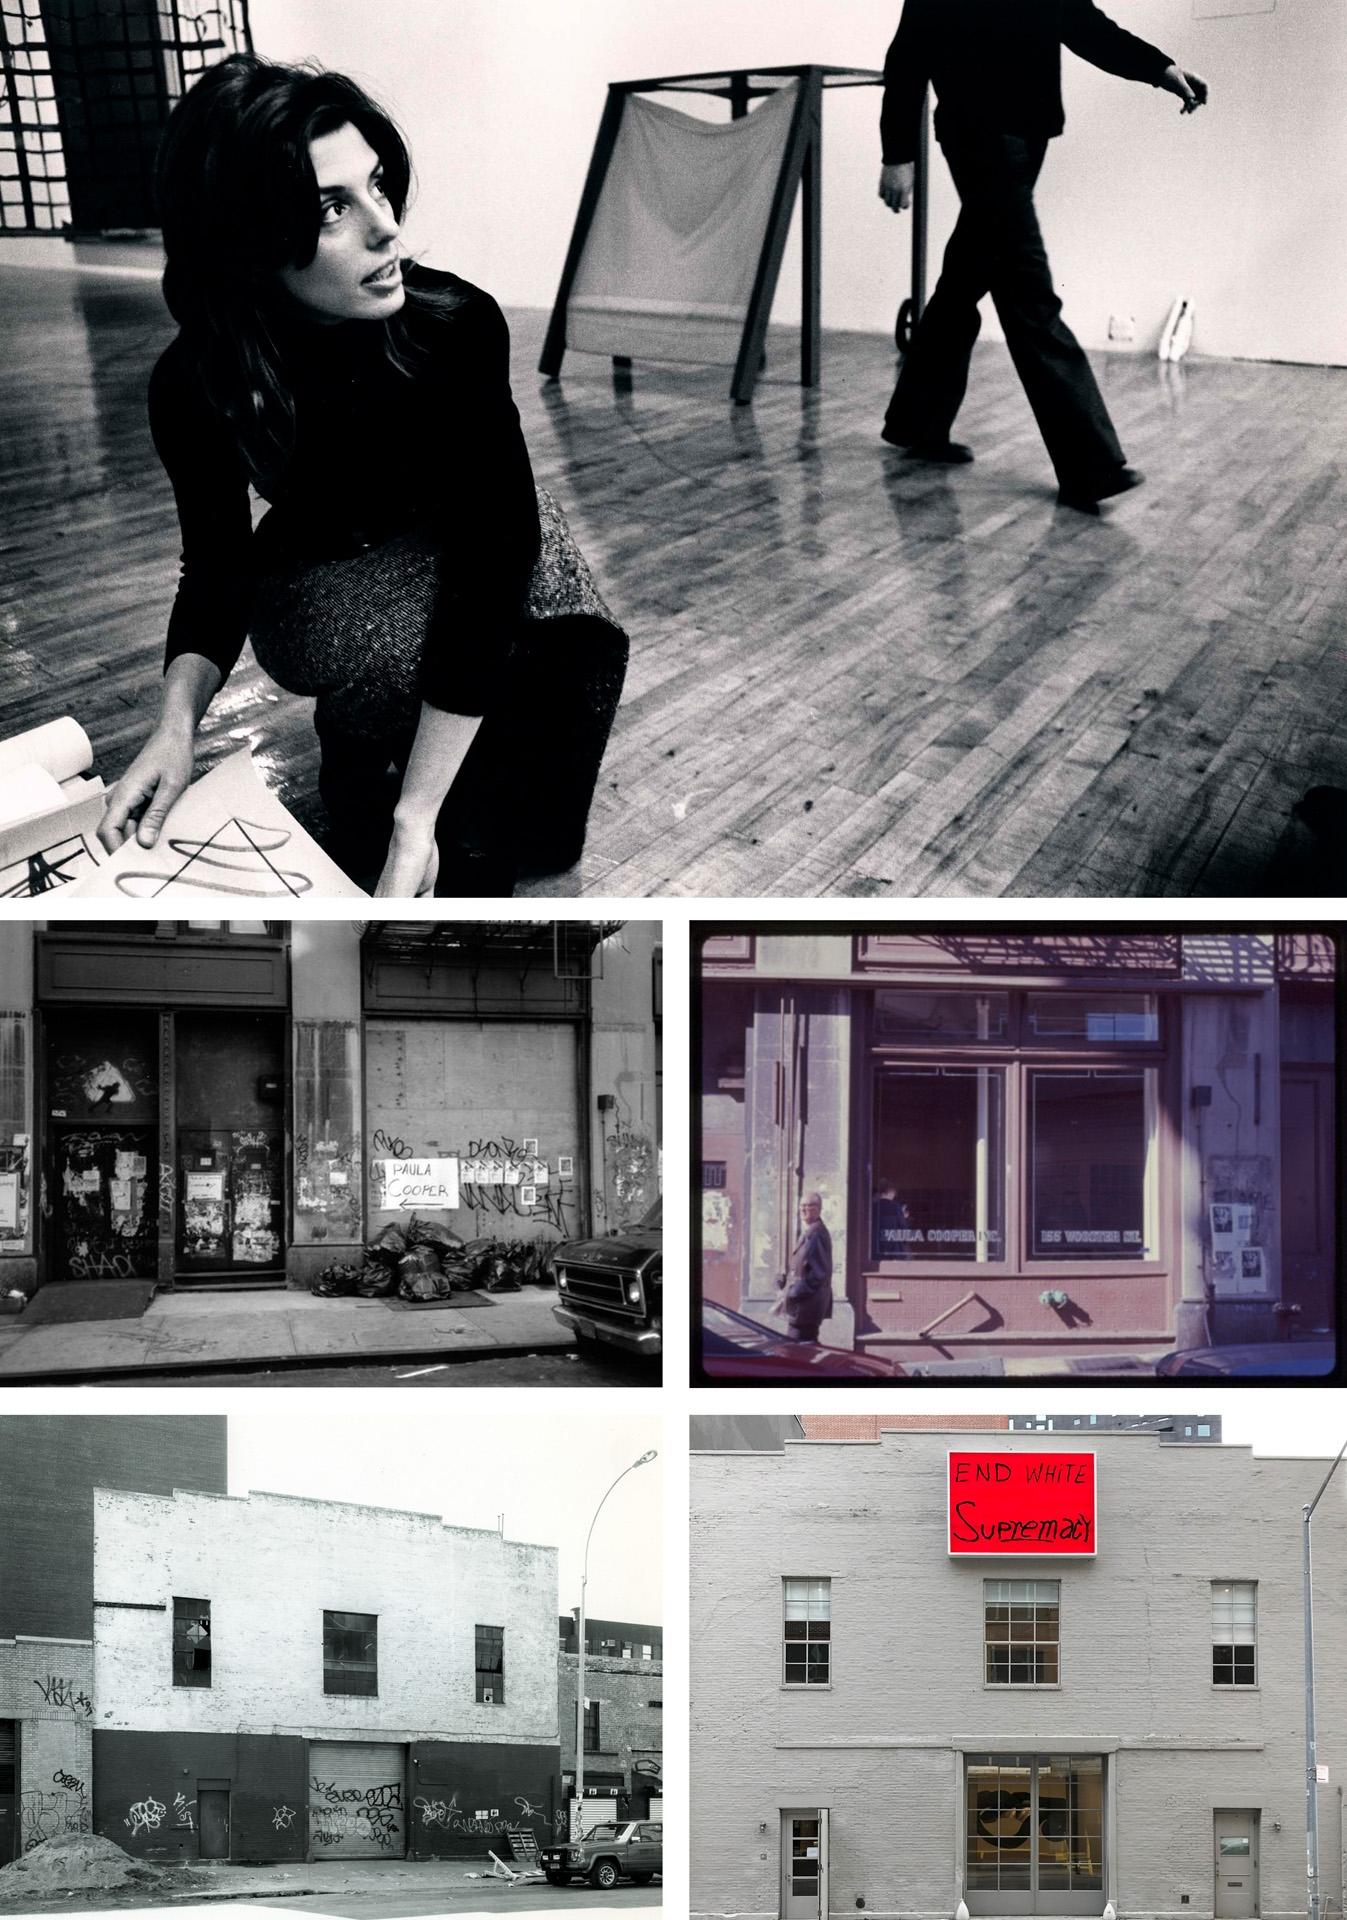 Photo credits (clockwise from top): unknown, Jaime Davidovich, EPW Studio, Geoffrey Clements, Jaime Davidovich